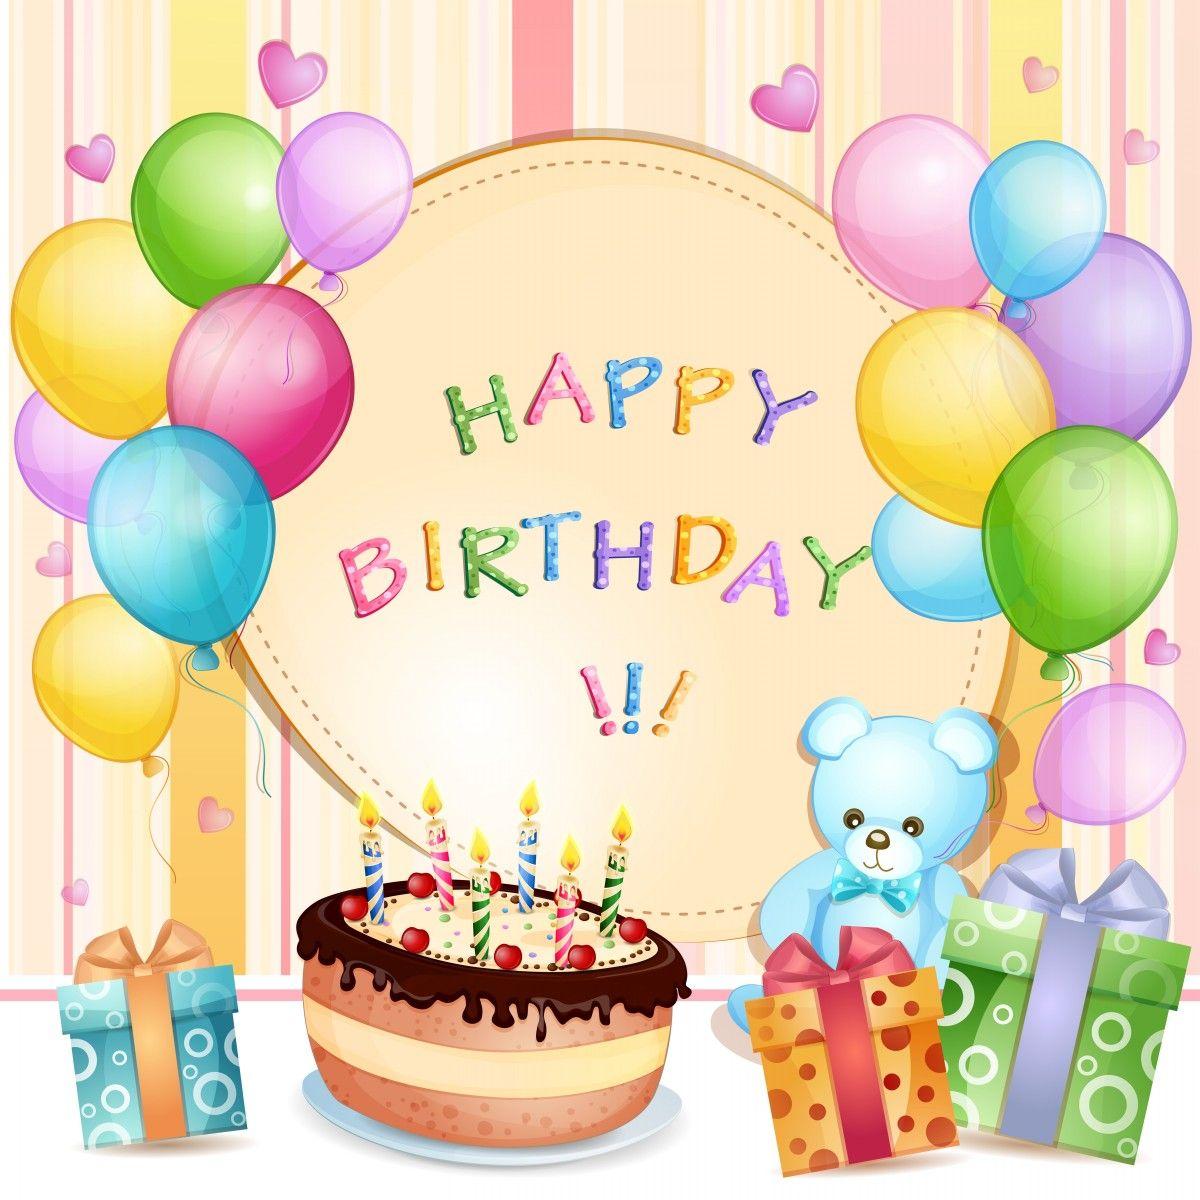 Happy Birthday Fb Cards bulk baby shower invitations baby shower – Birthday Singing Card